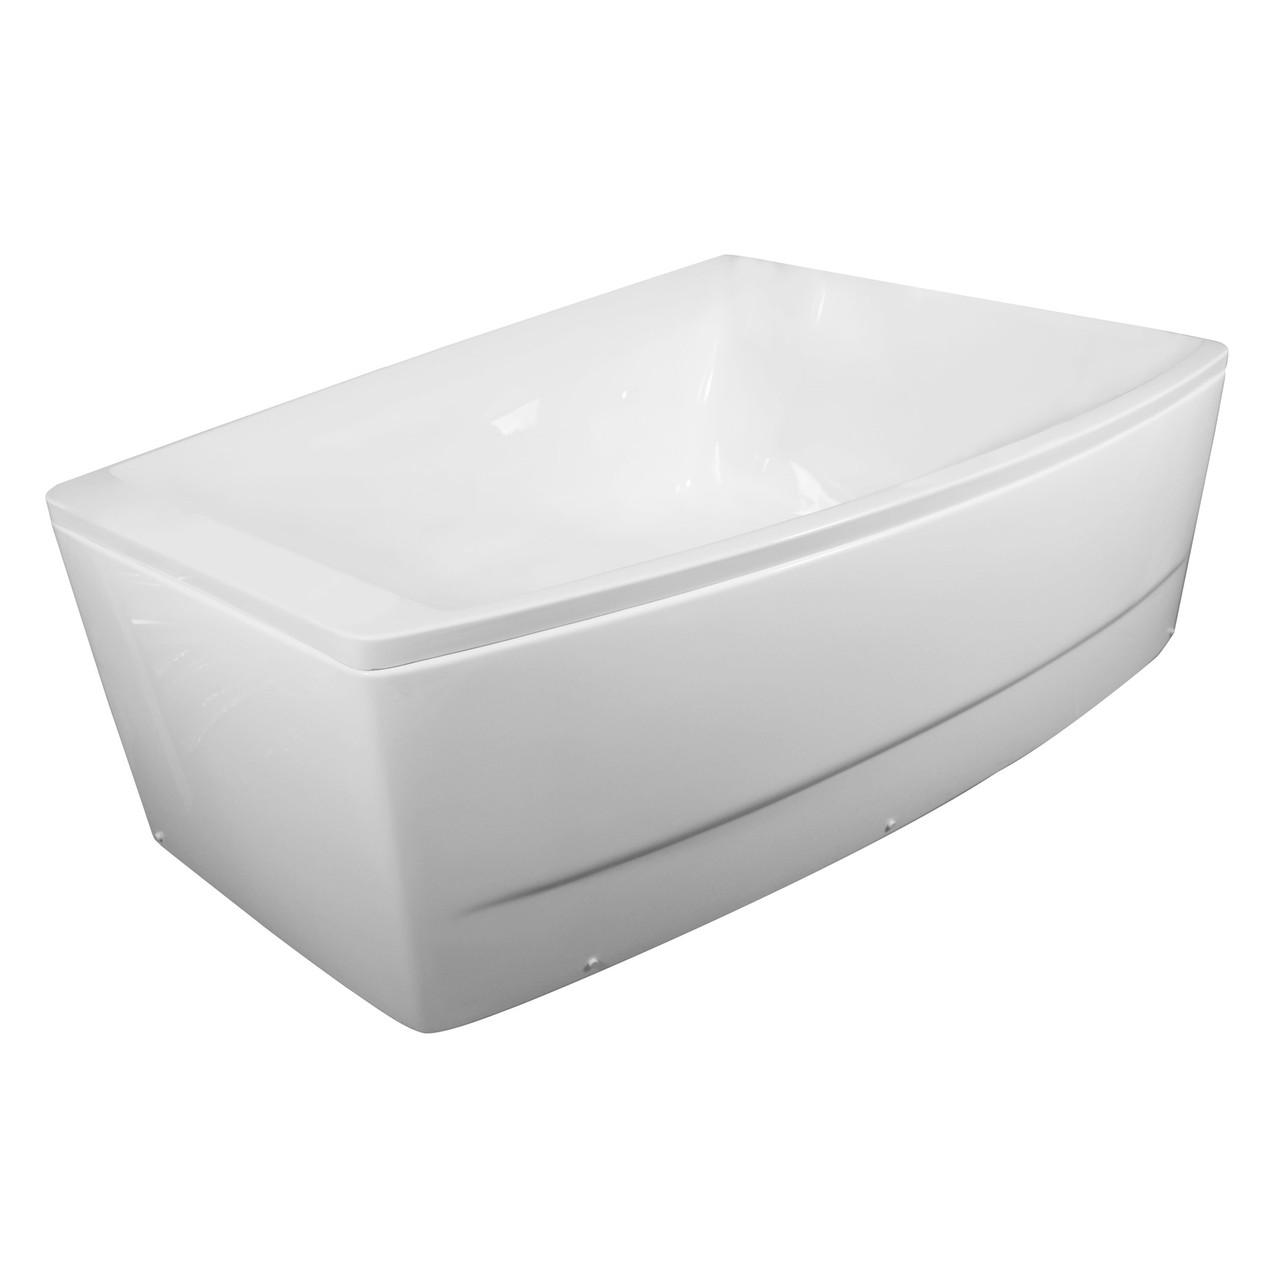 Ванна 170*120*63см асимметричная, правая, без гидромассажа